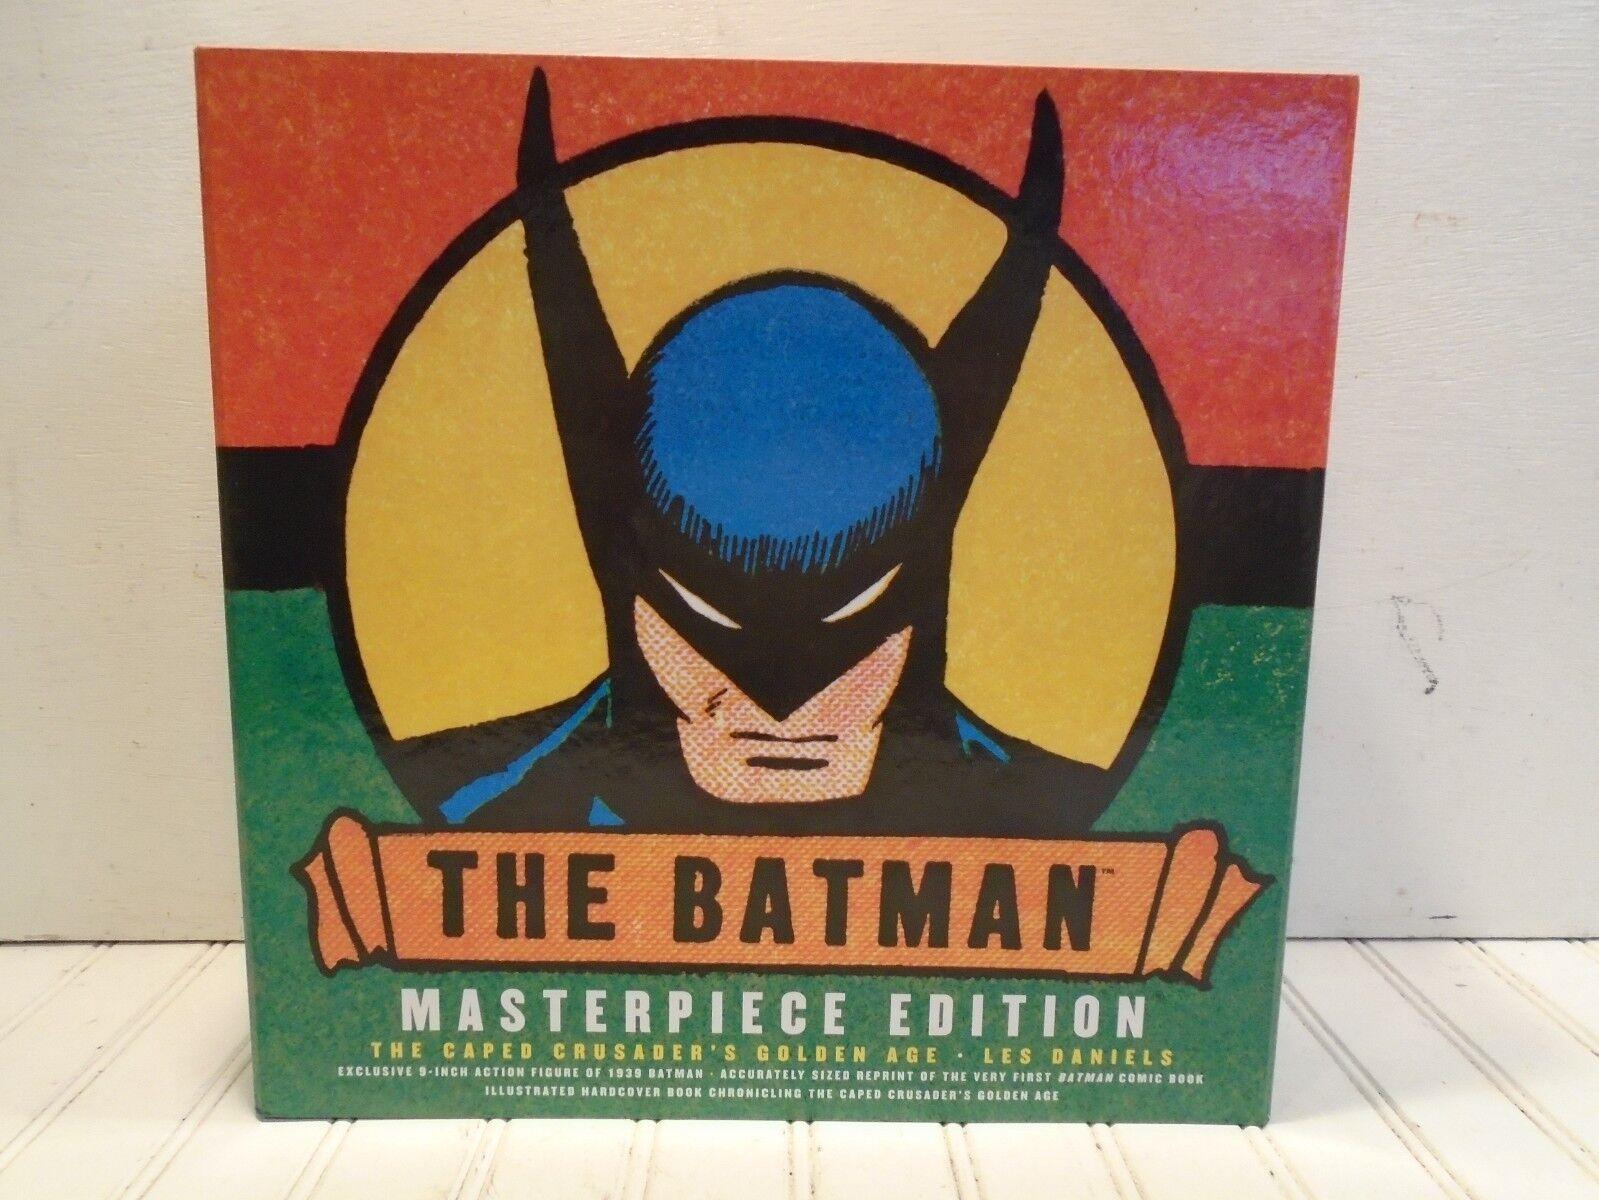 Batman meisterwerk ausgabe - nmint, comic - statue, hardcover - buch